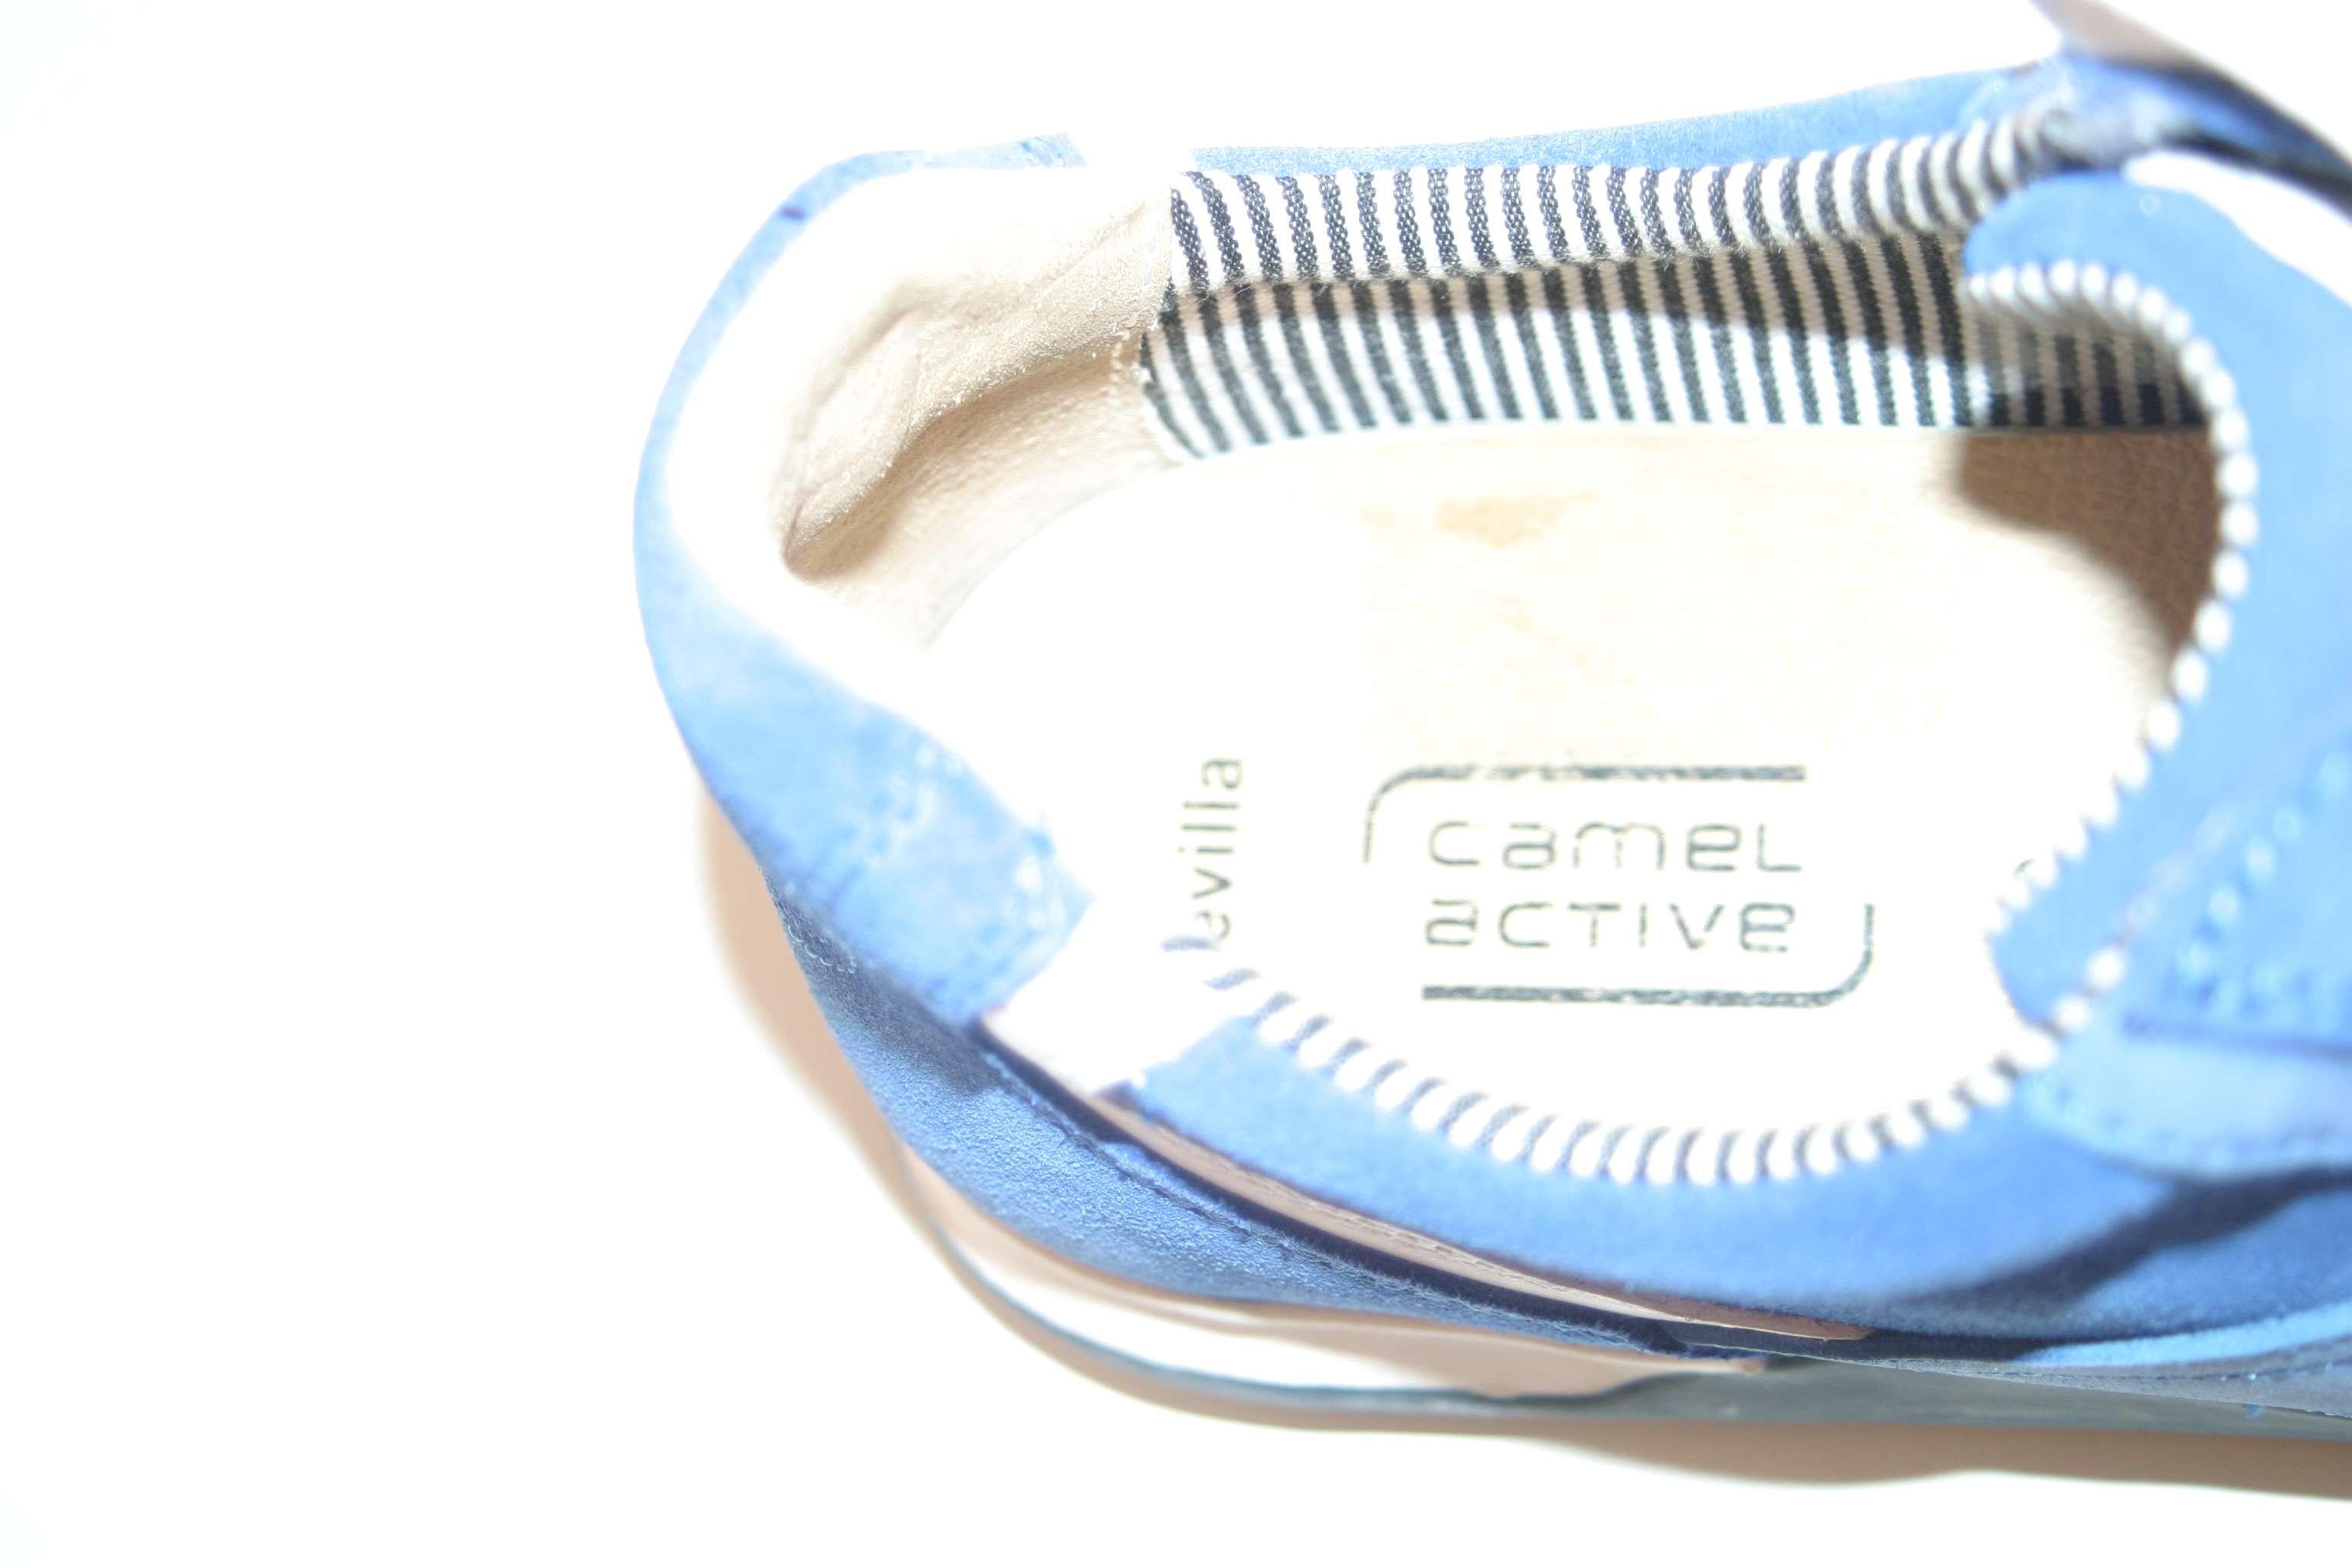 camel active bequeme halbschuhe damenschuhe blau royalblau gr e 8 41 1 2 ebay. Black Bedroom Furniture Sets. Home Design Ideas